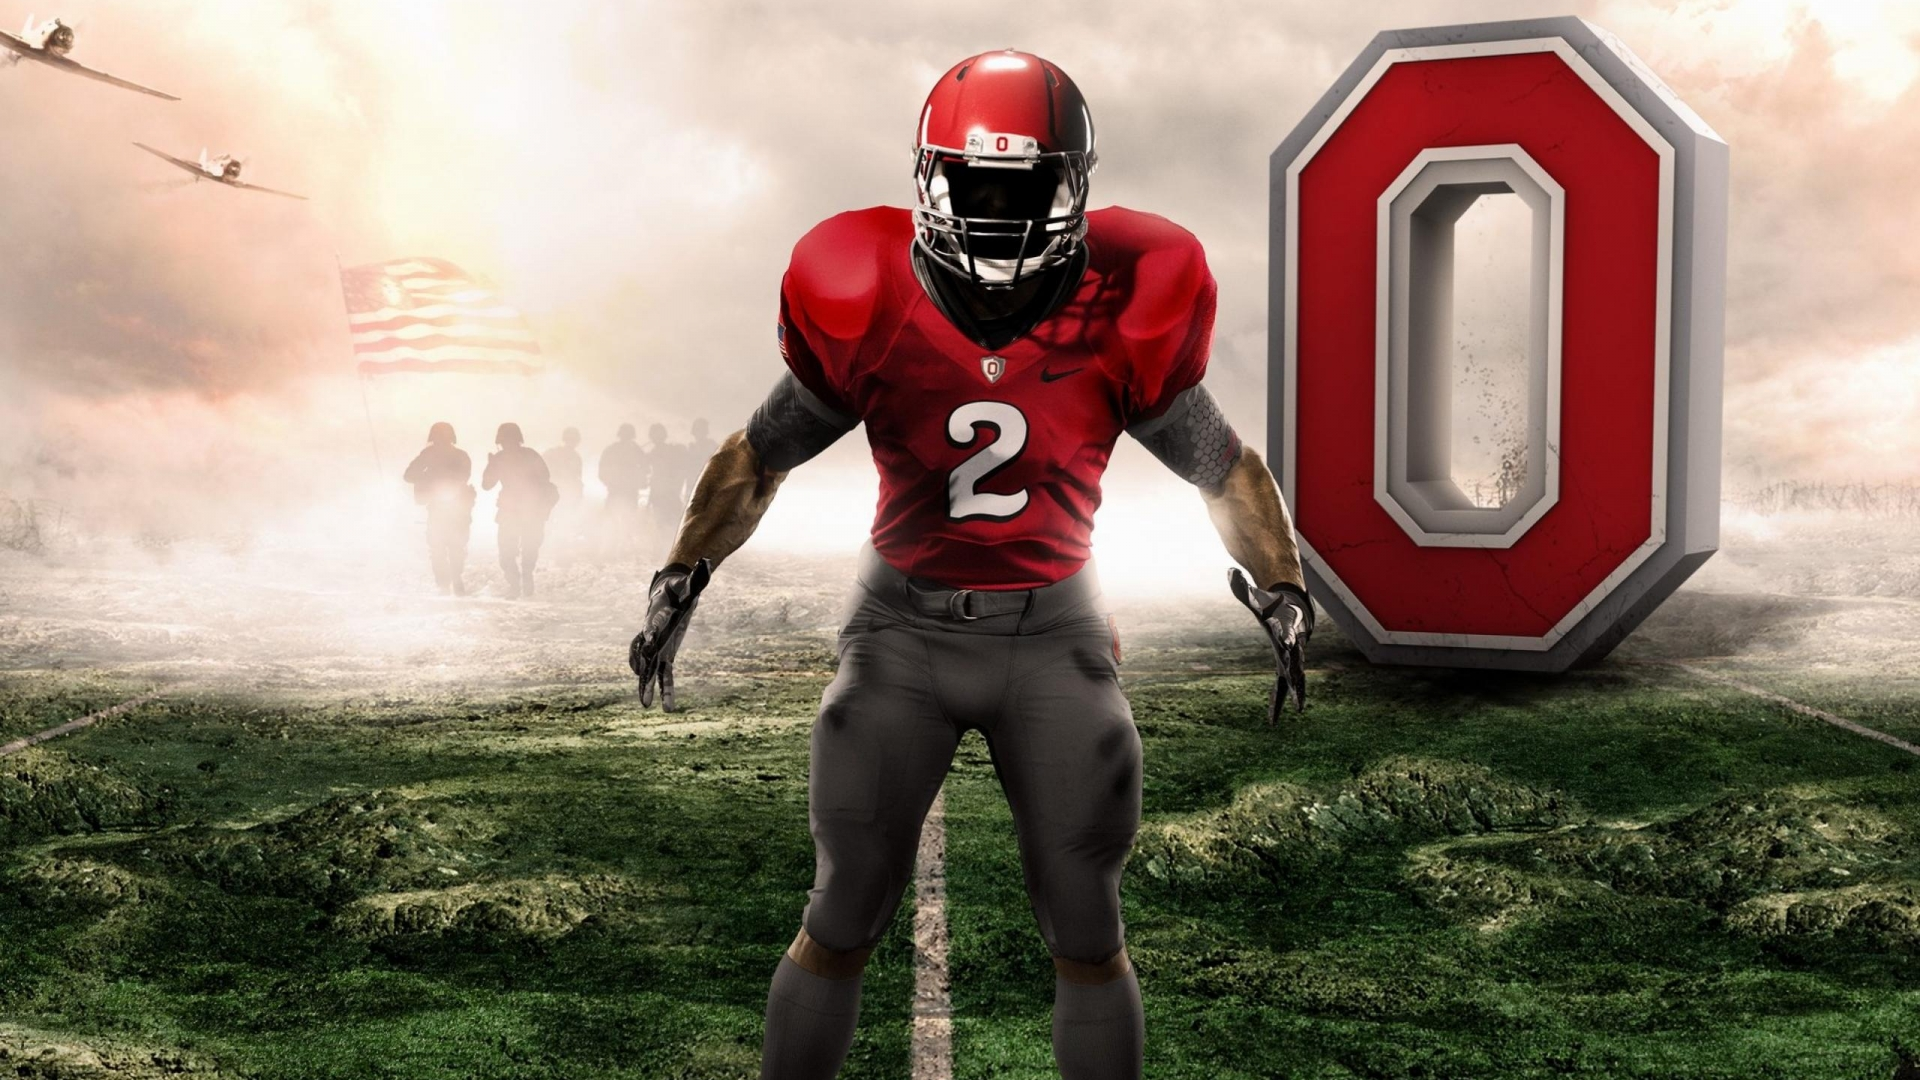 Nike Football Wallpaper 2012 College football 1920x1080